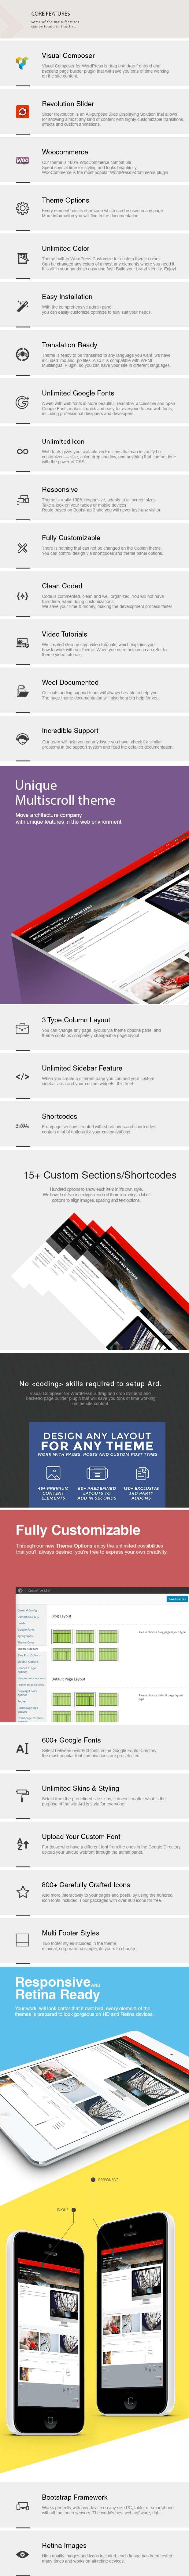 CORPOTERA - Responsive Corporate Business WordPress Theme - 3